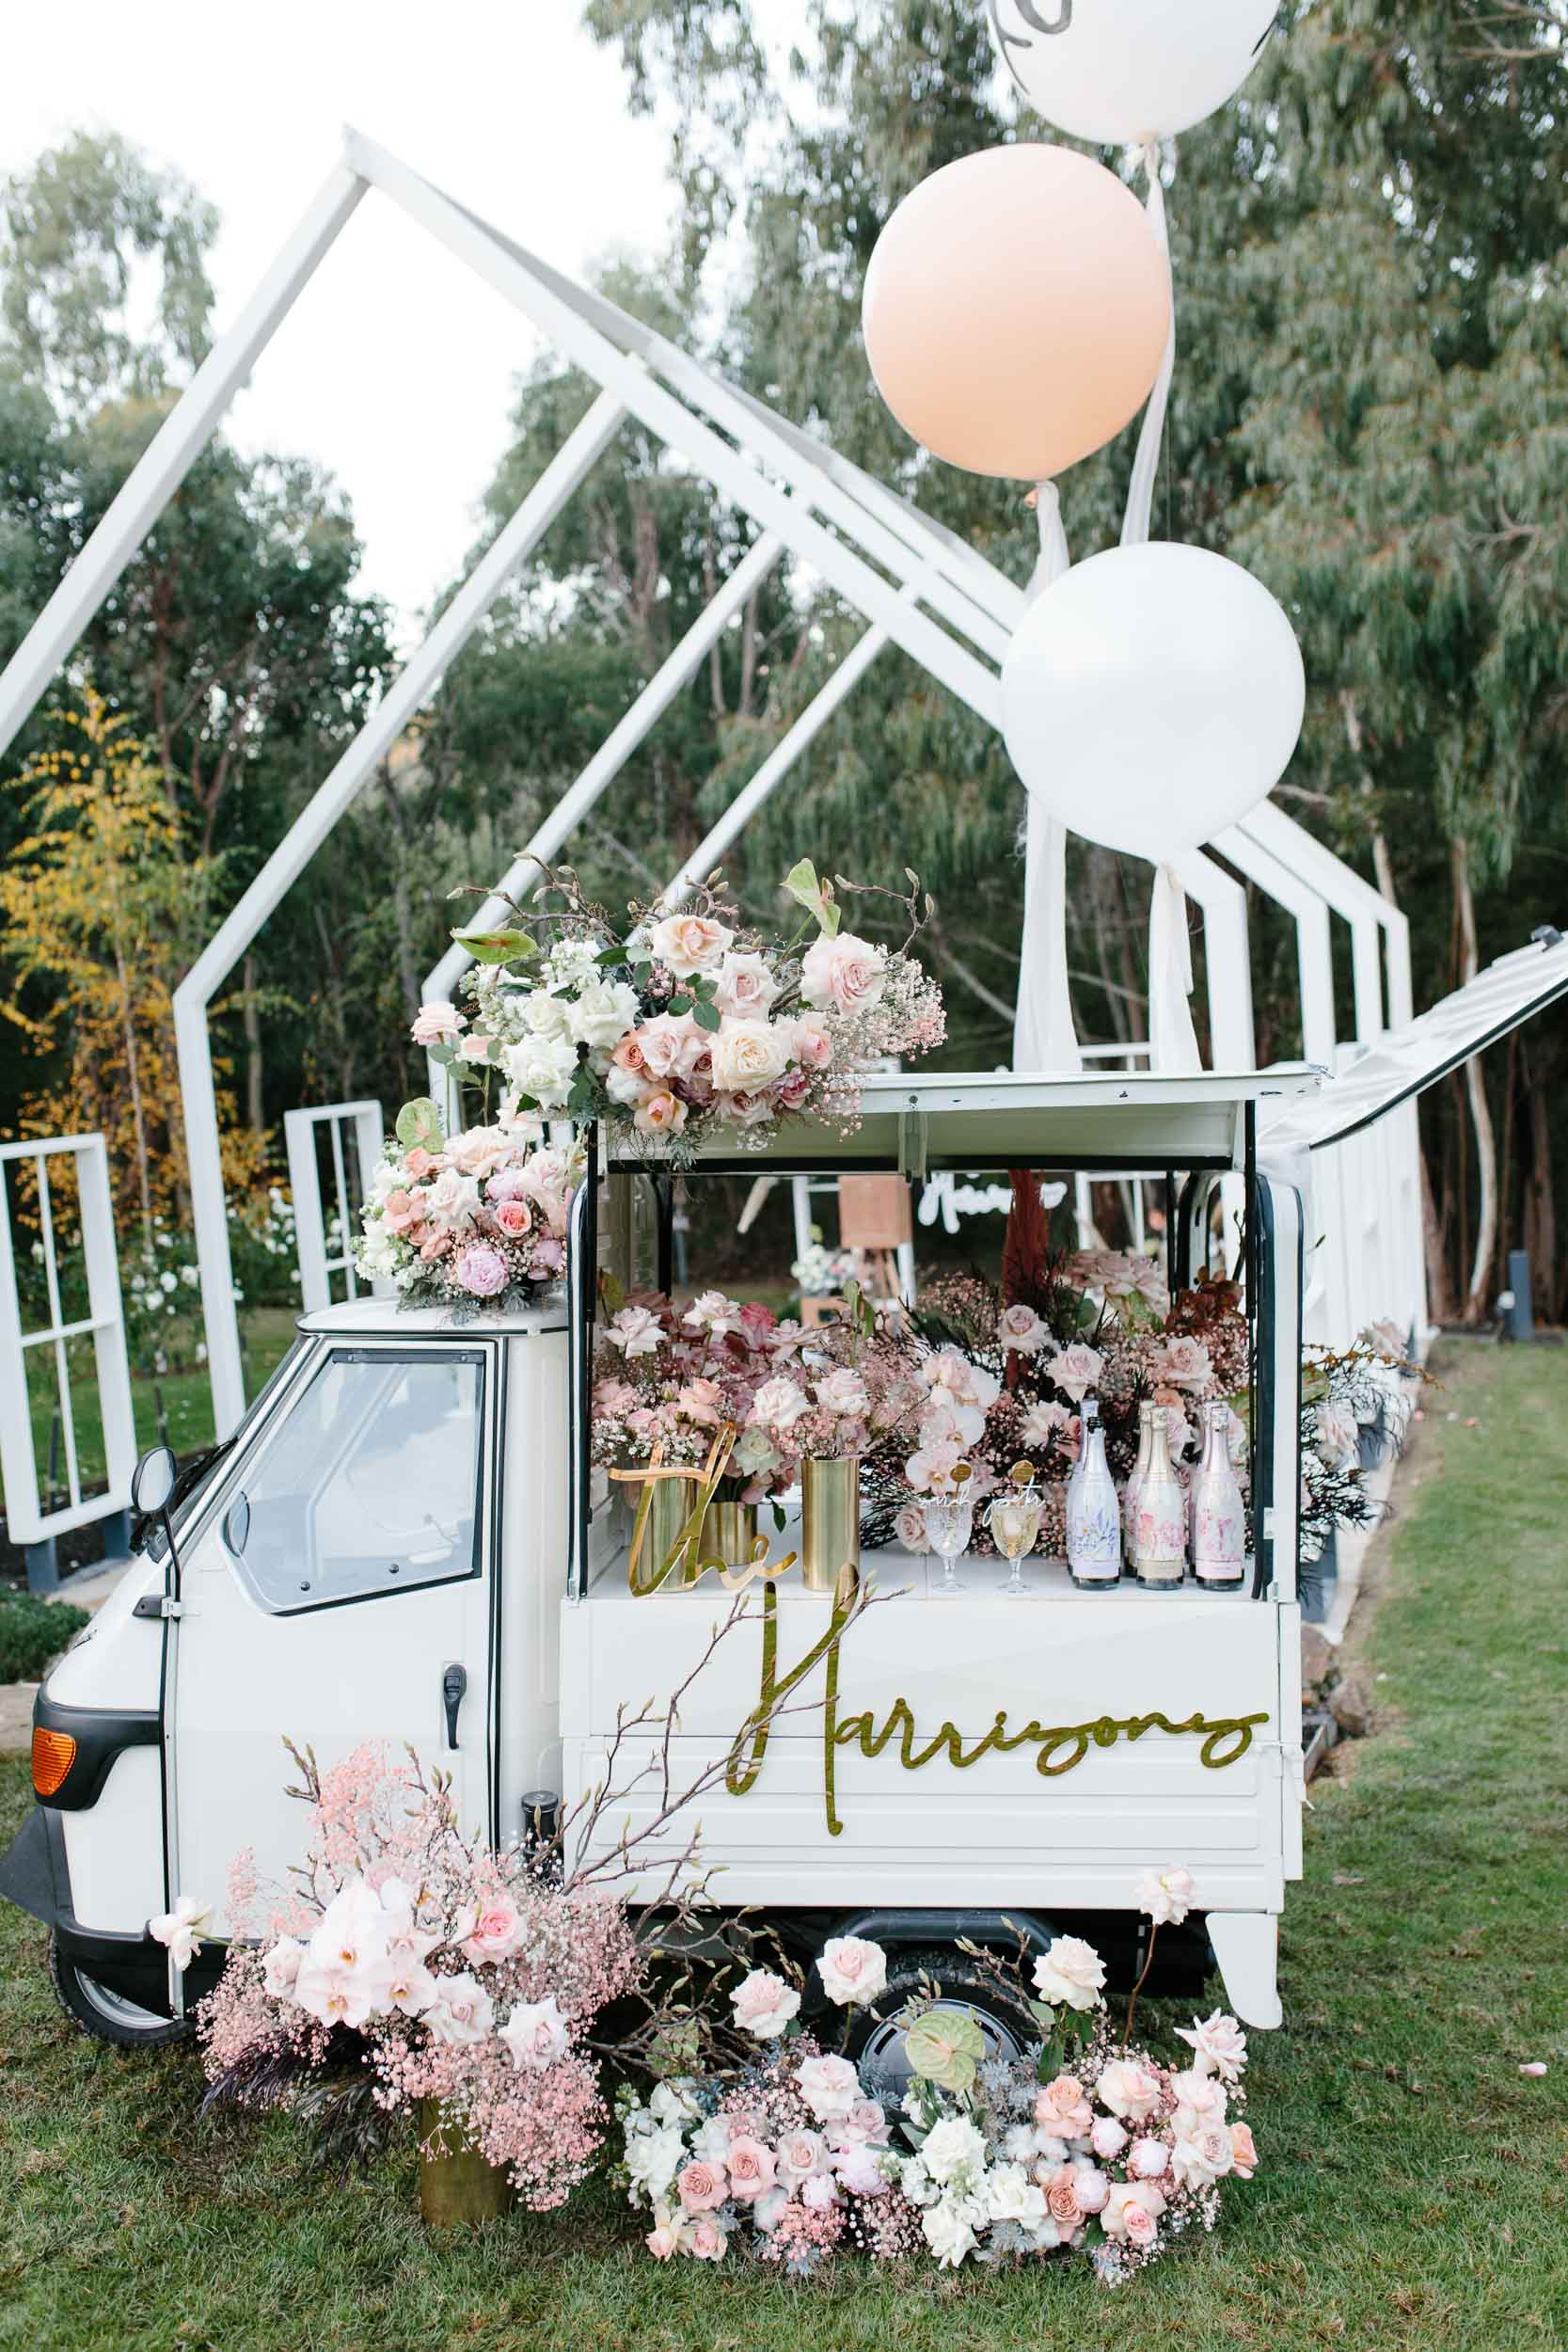 Kas-Richards-LENZO-Yarra-Valley-Wedding-One-Day-Bridal-413.jpg